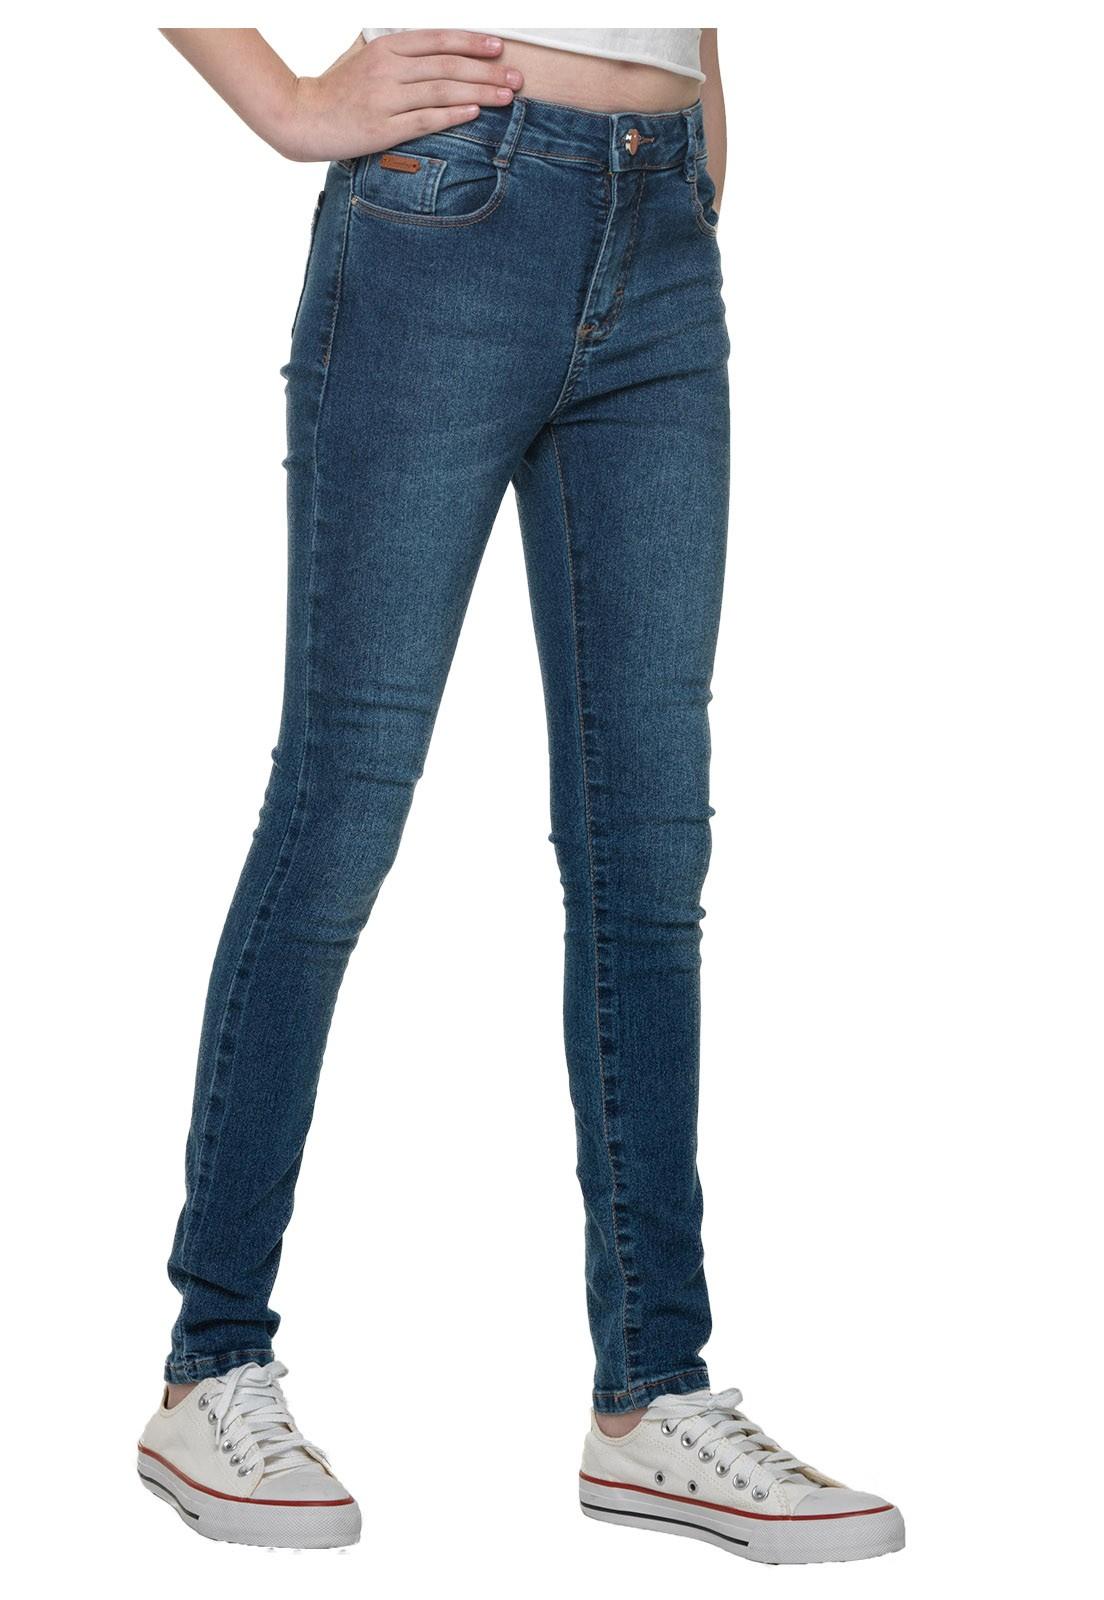 Calça Feminina Crawling Skinny Jeans